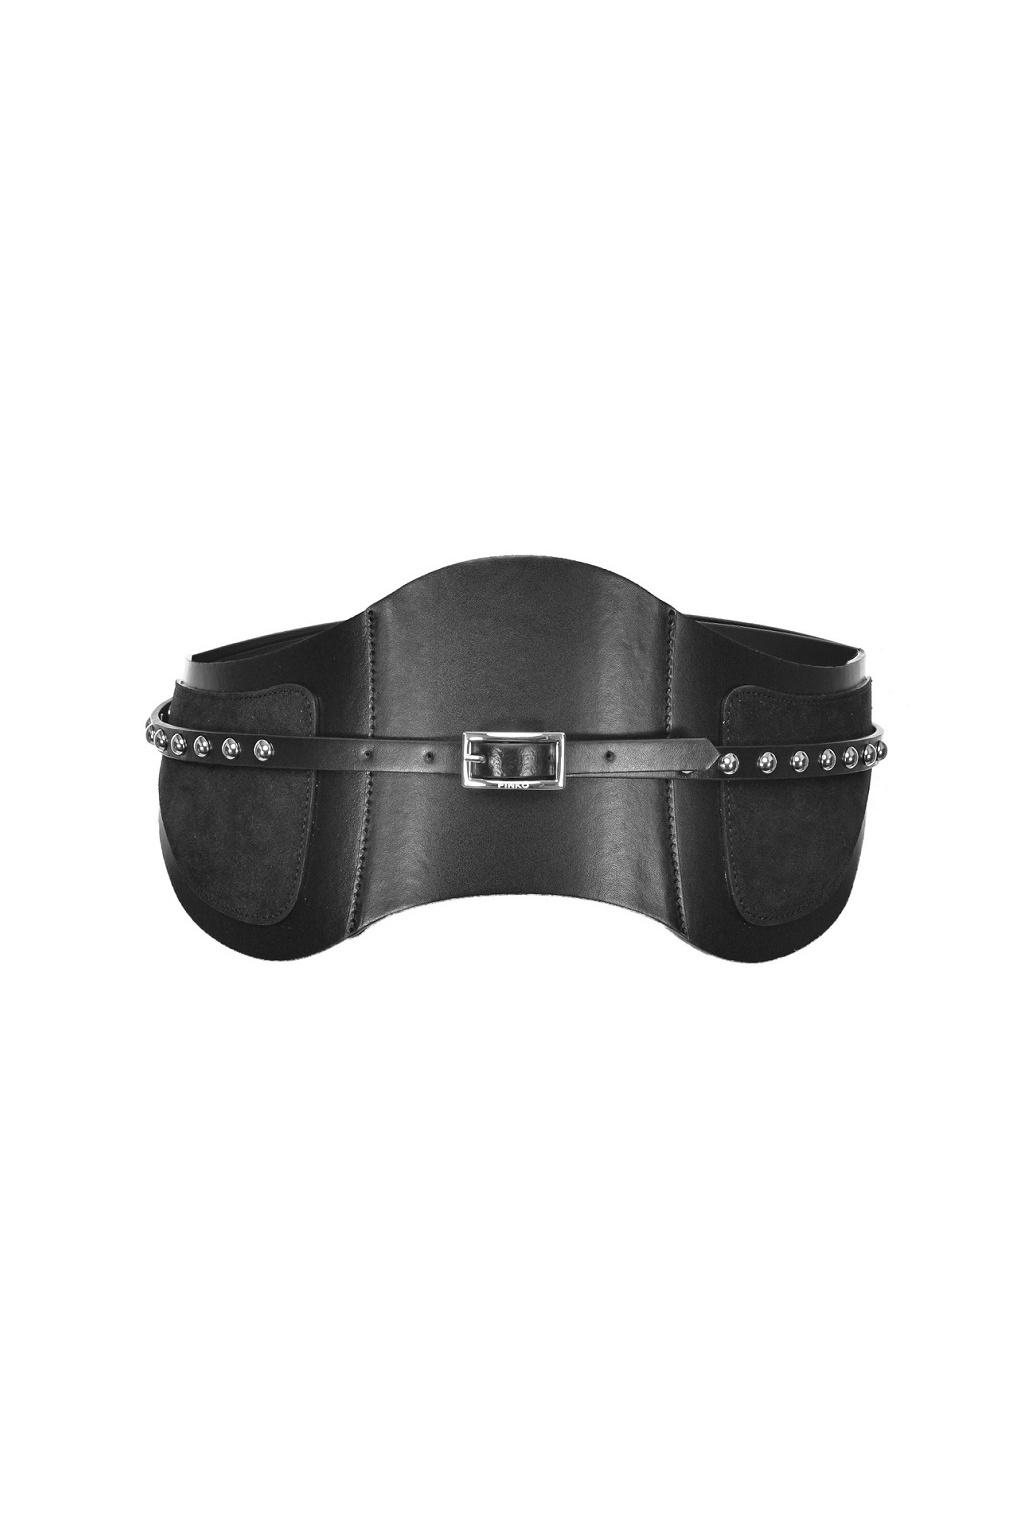 1H20SW Y6GK Dámský pásek Pinko Gufare černý